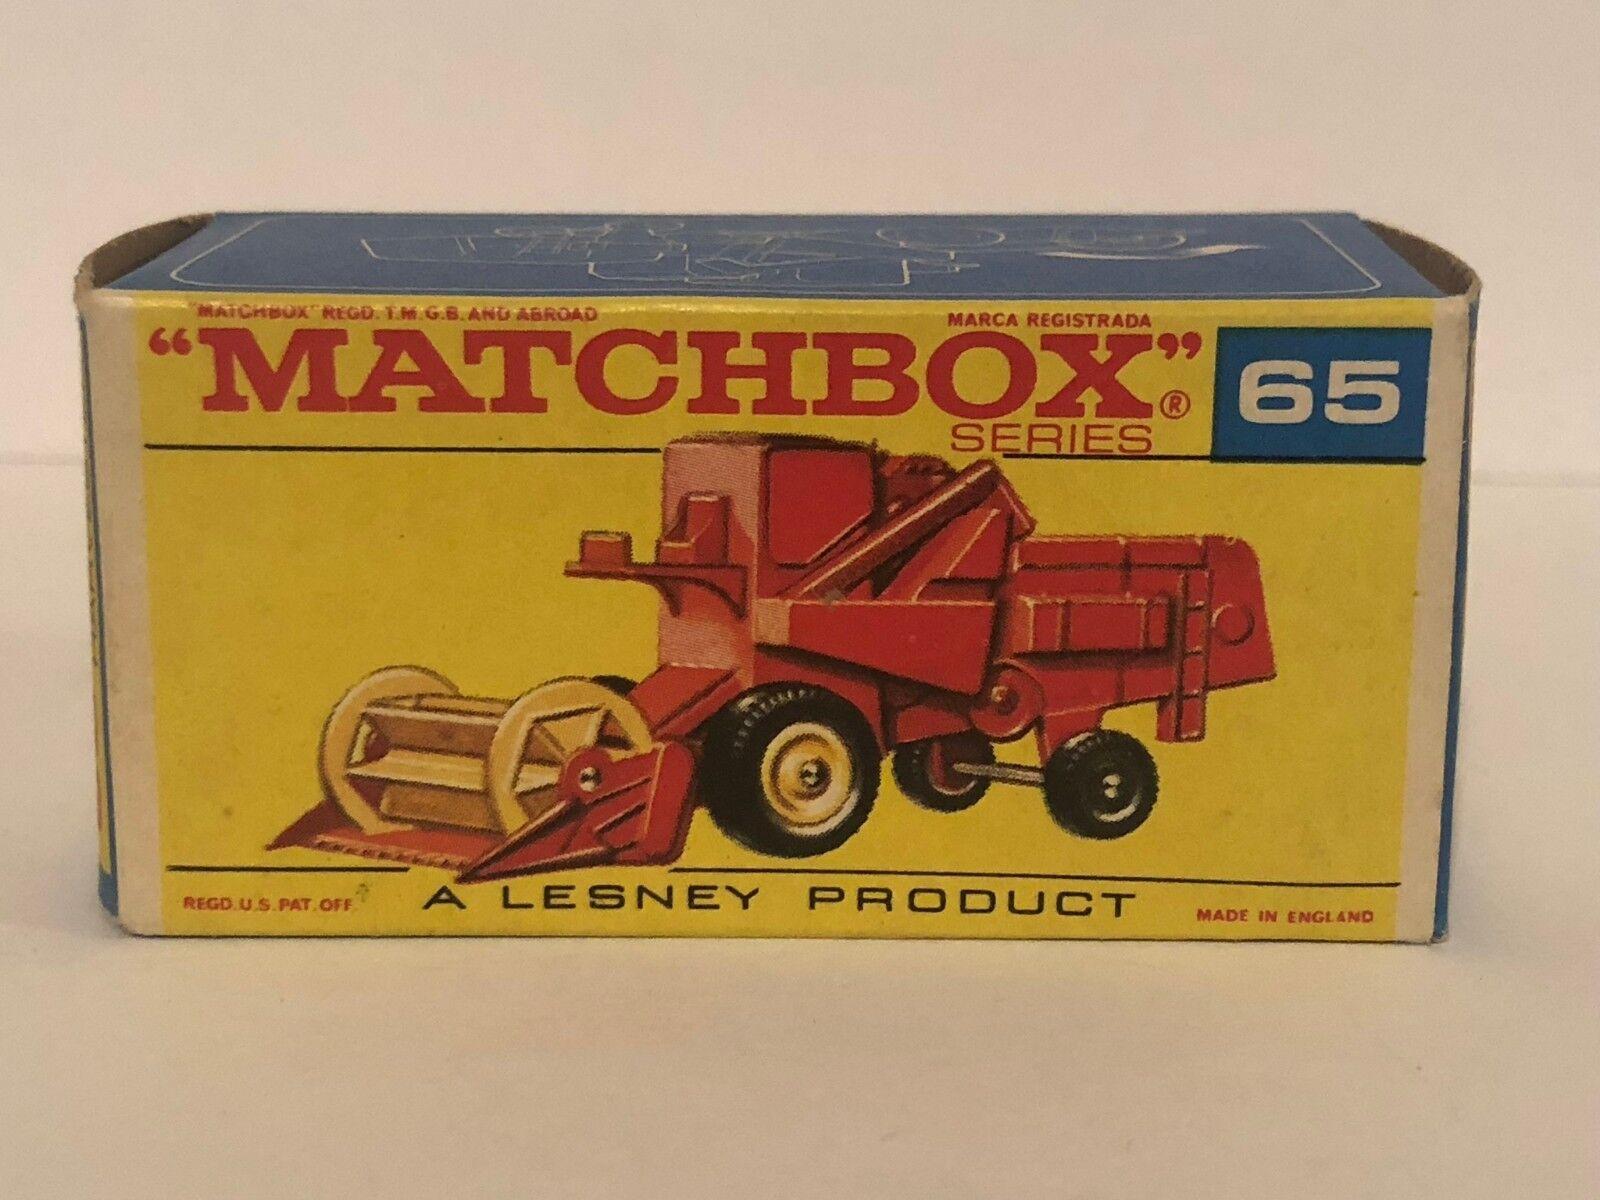 Matchbox 65 CLAAS Combine Harvester Red Excellent Original Original Original Box d4033c